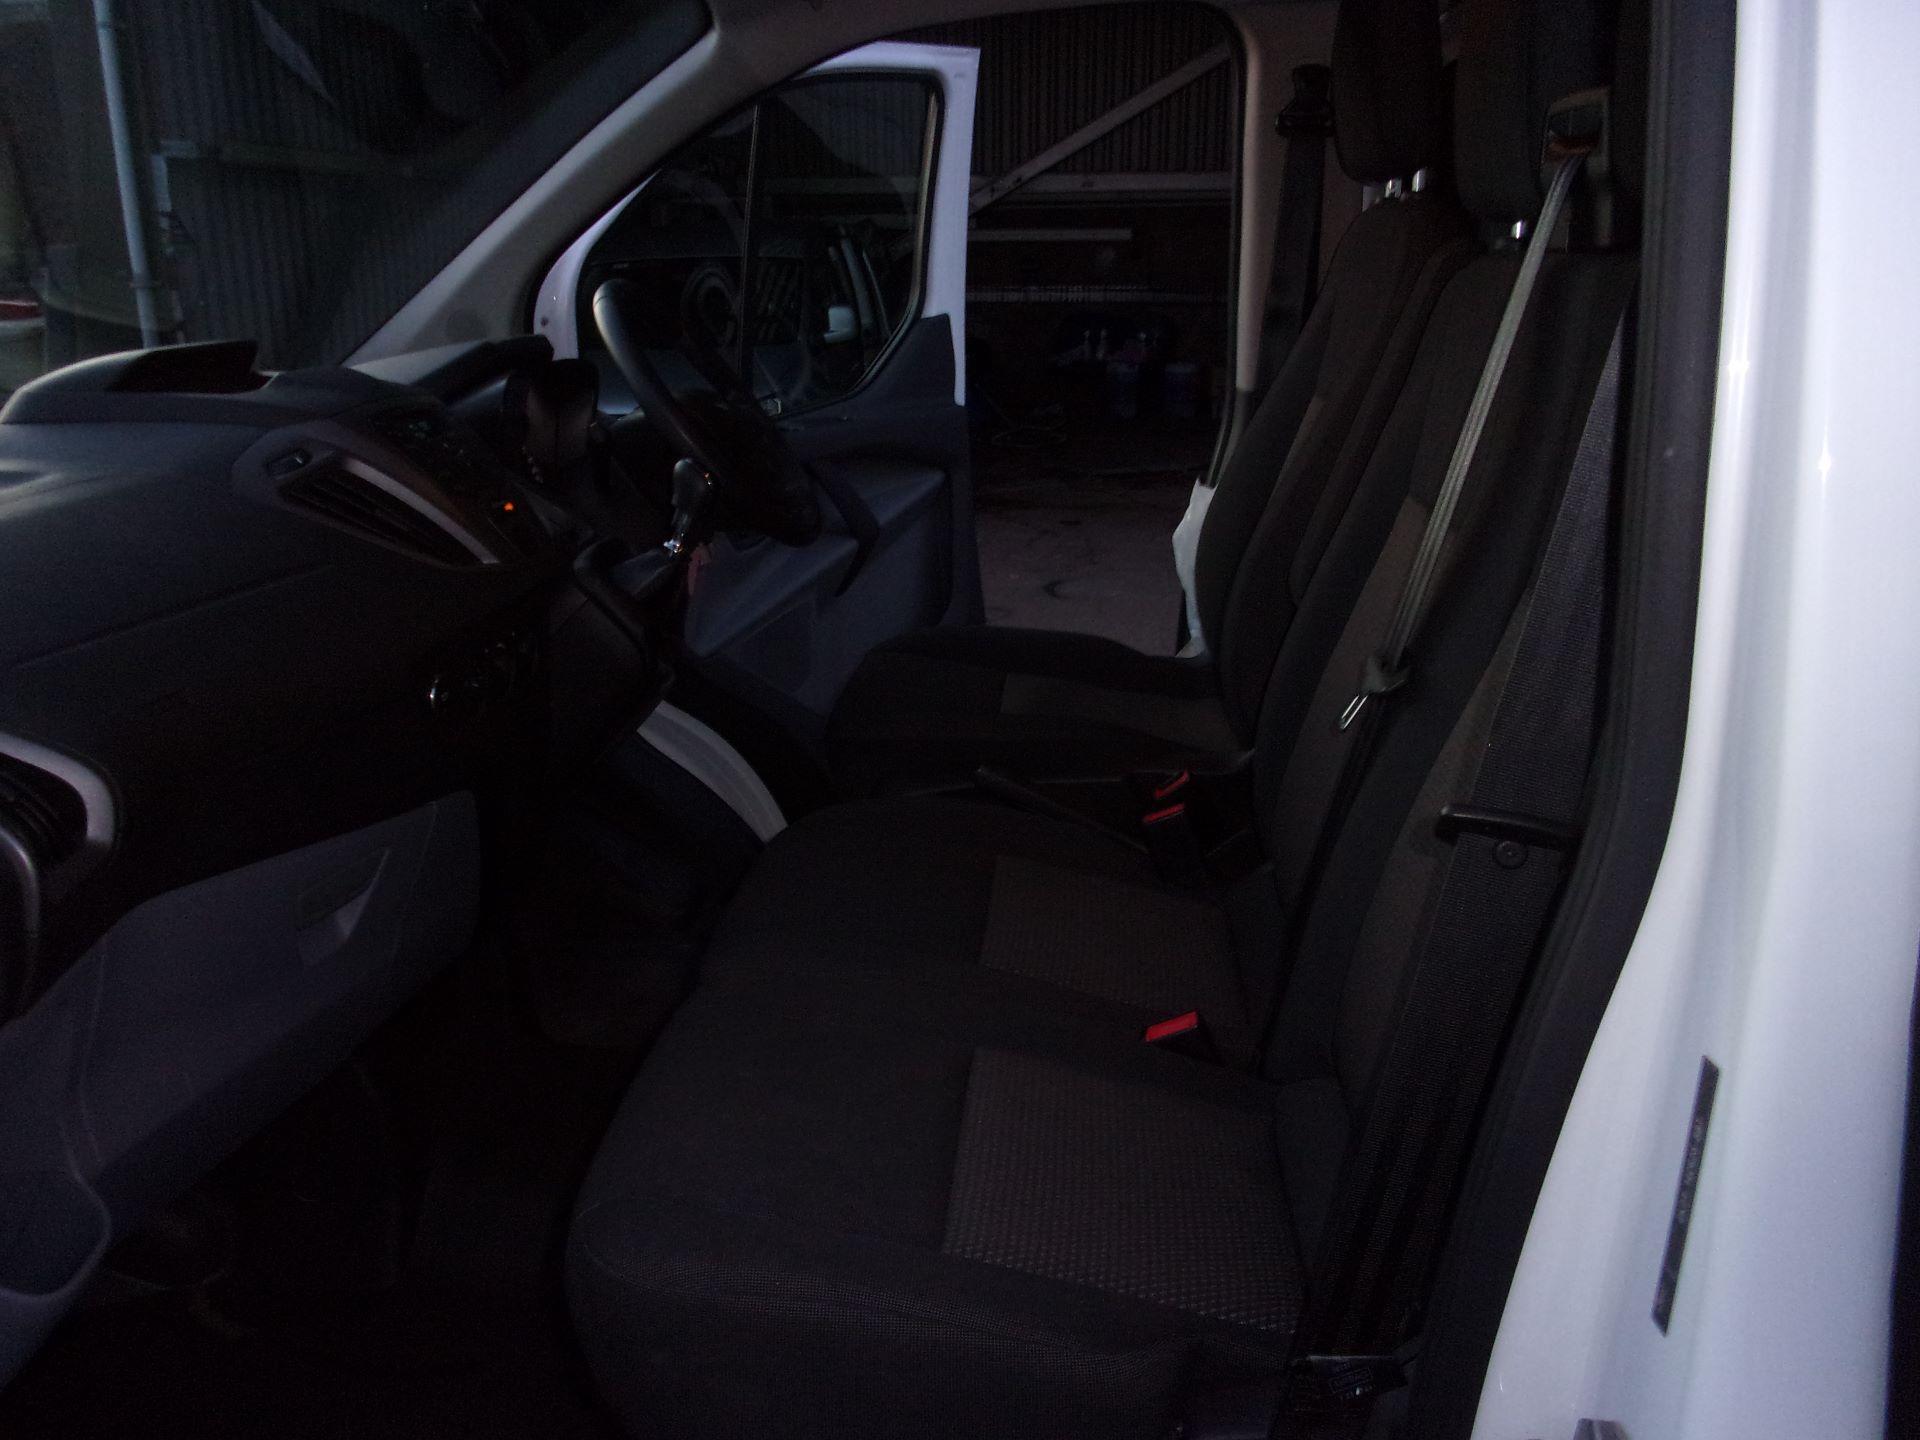 2017 Ford Transit Custom 310 L2 DIESEL FWD 2.0 TDCI 130PS LOW ROOF KOMBI EURO 6 (FG67ERU) Image 16